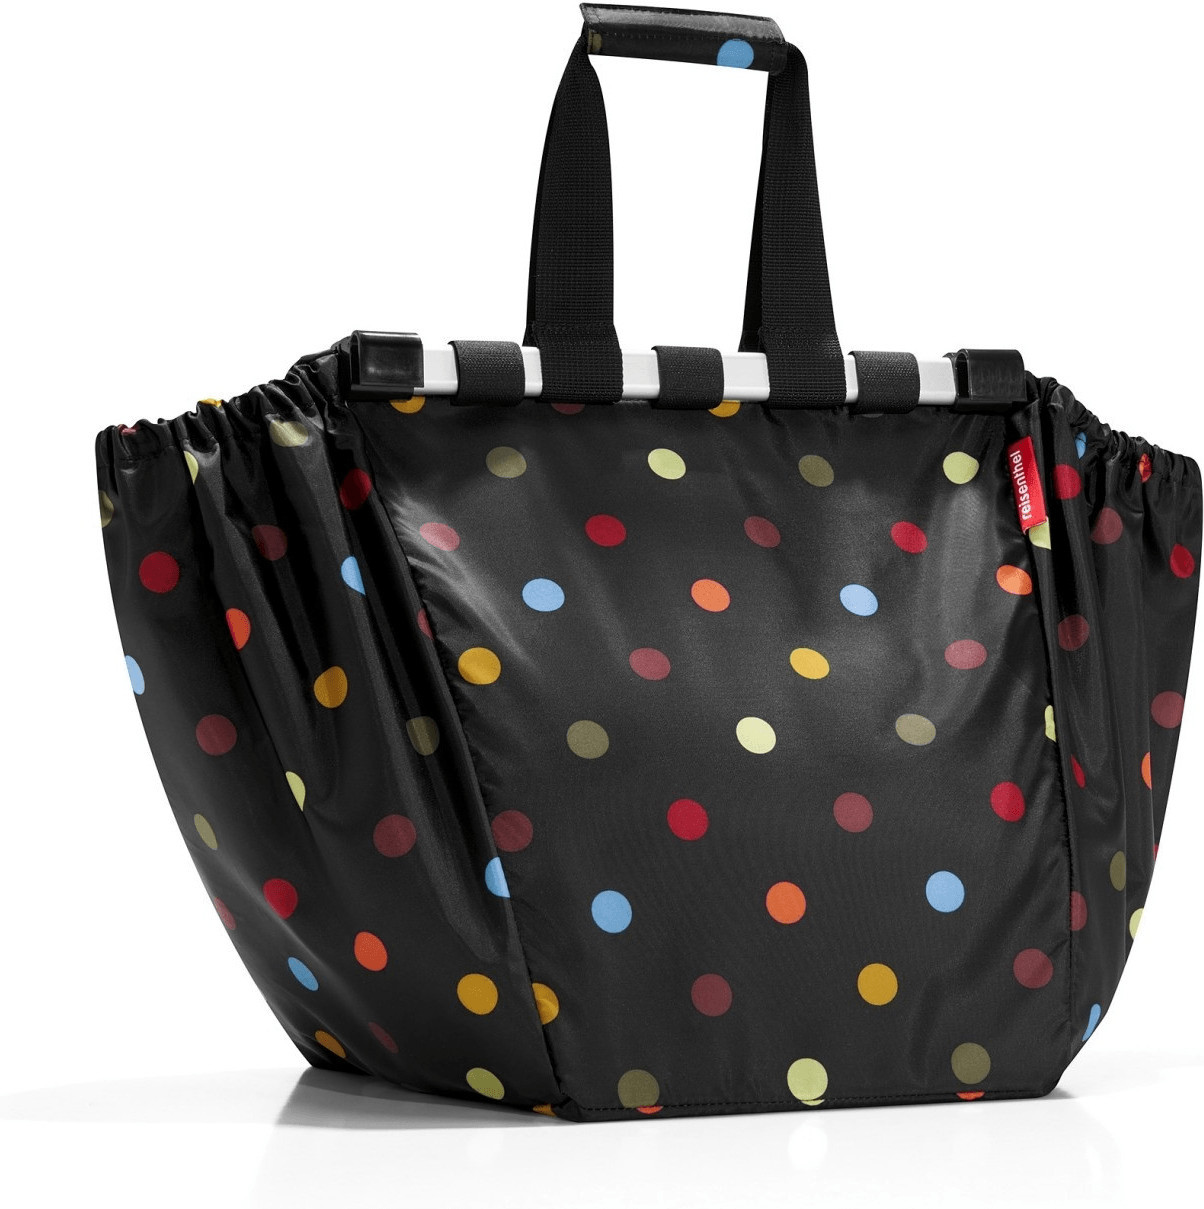 Reisenthel Easyshoppingbag dots